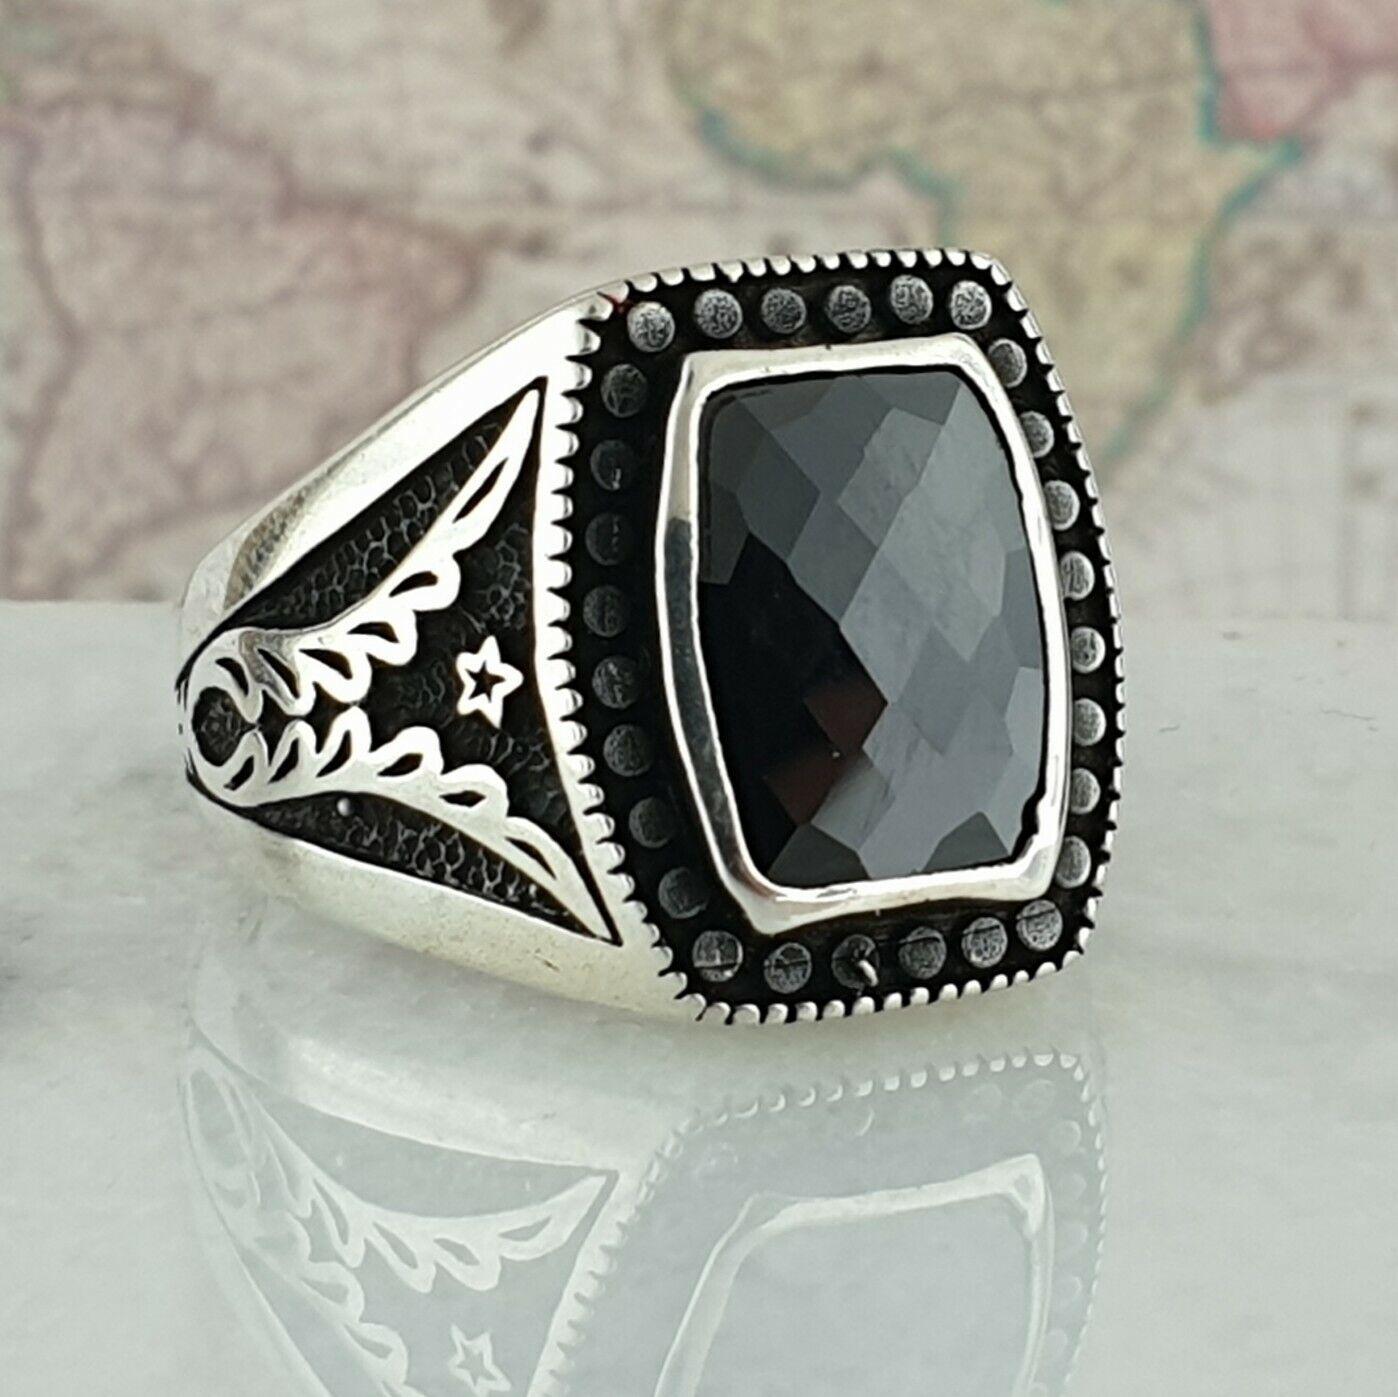 Turco otomano Negro Onyx piedras preciosas sólido de plata esterlina 925 Anillo para hombre